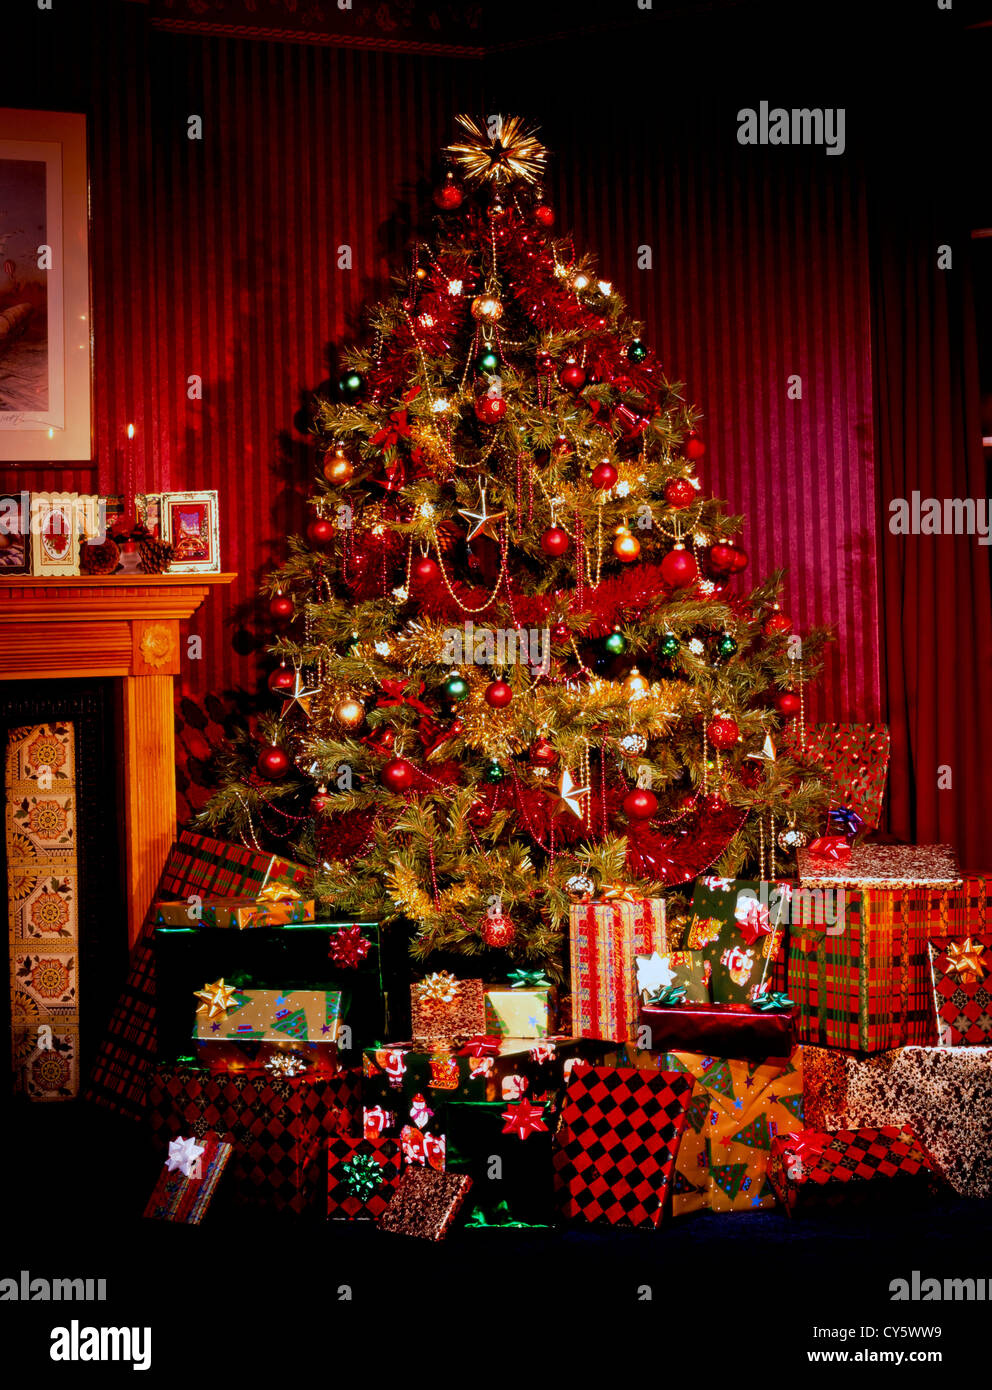 Christmas Stocking Presents Stockfotos & Christmas Stocking Presents ...